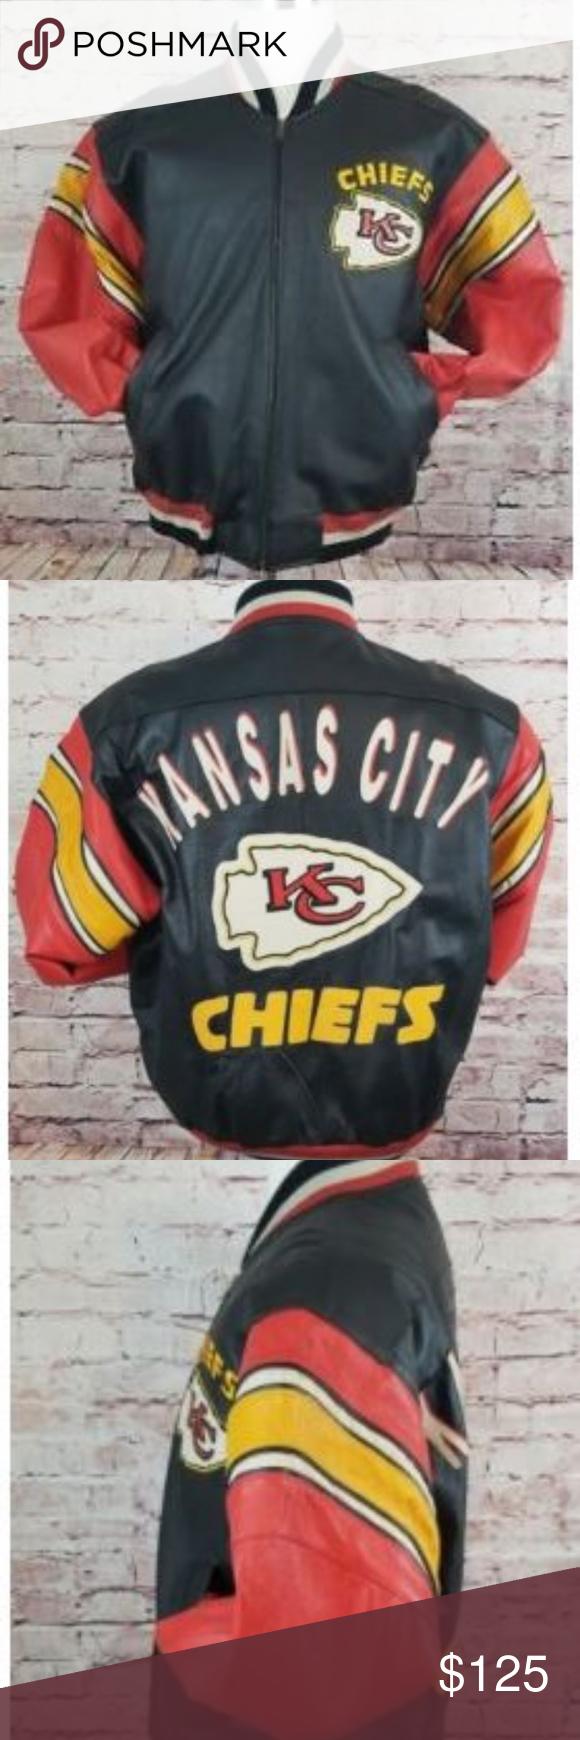 Kansas City Chiefs Men S Leather Jacket Medium Nfl Men S Leather Jacket Leather Jacket Jackets [ 1740 x 580 Pixel ]